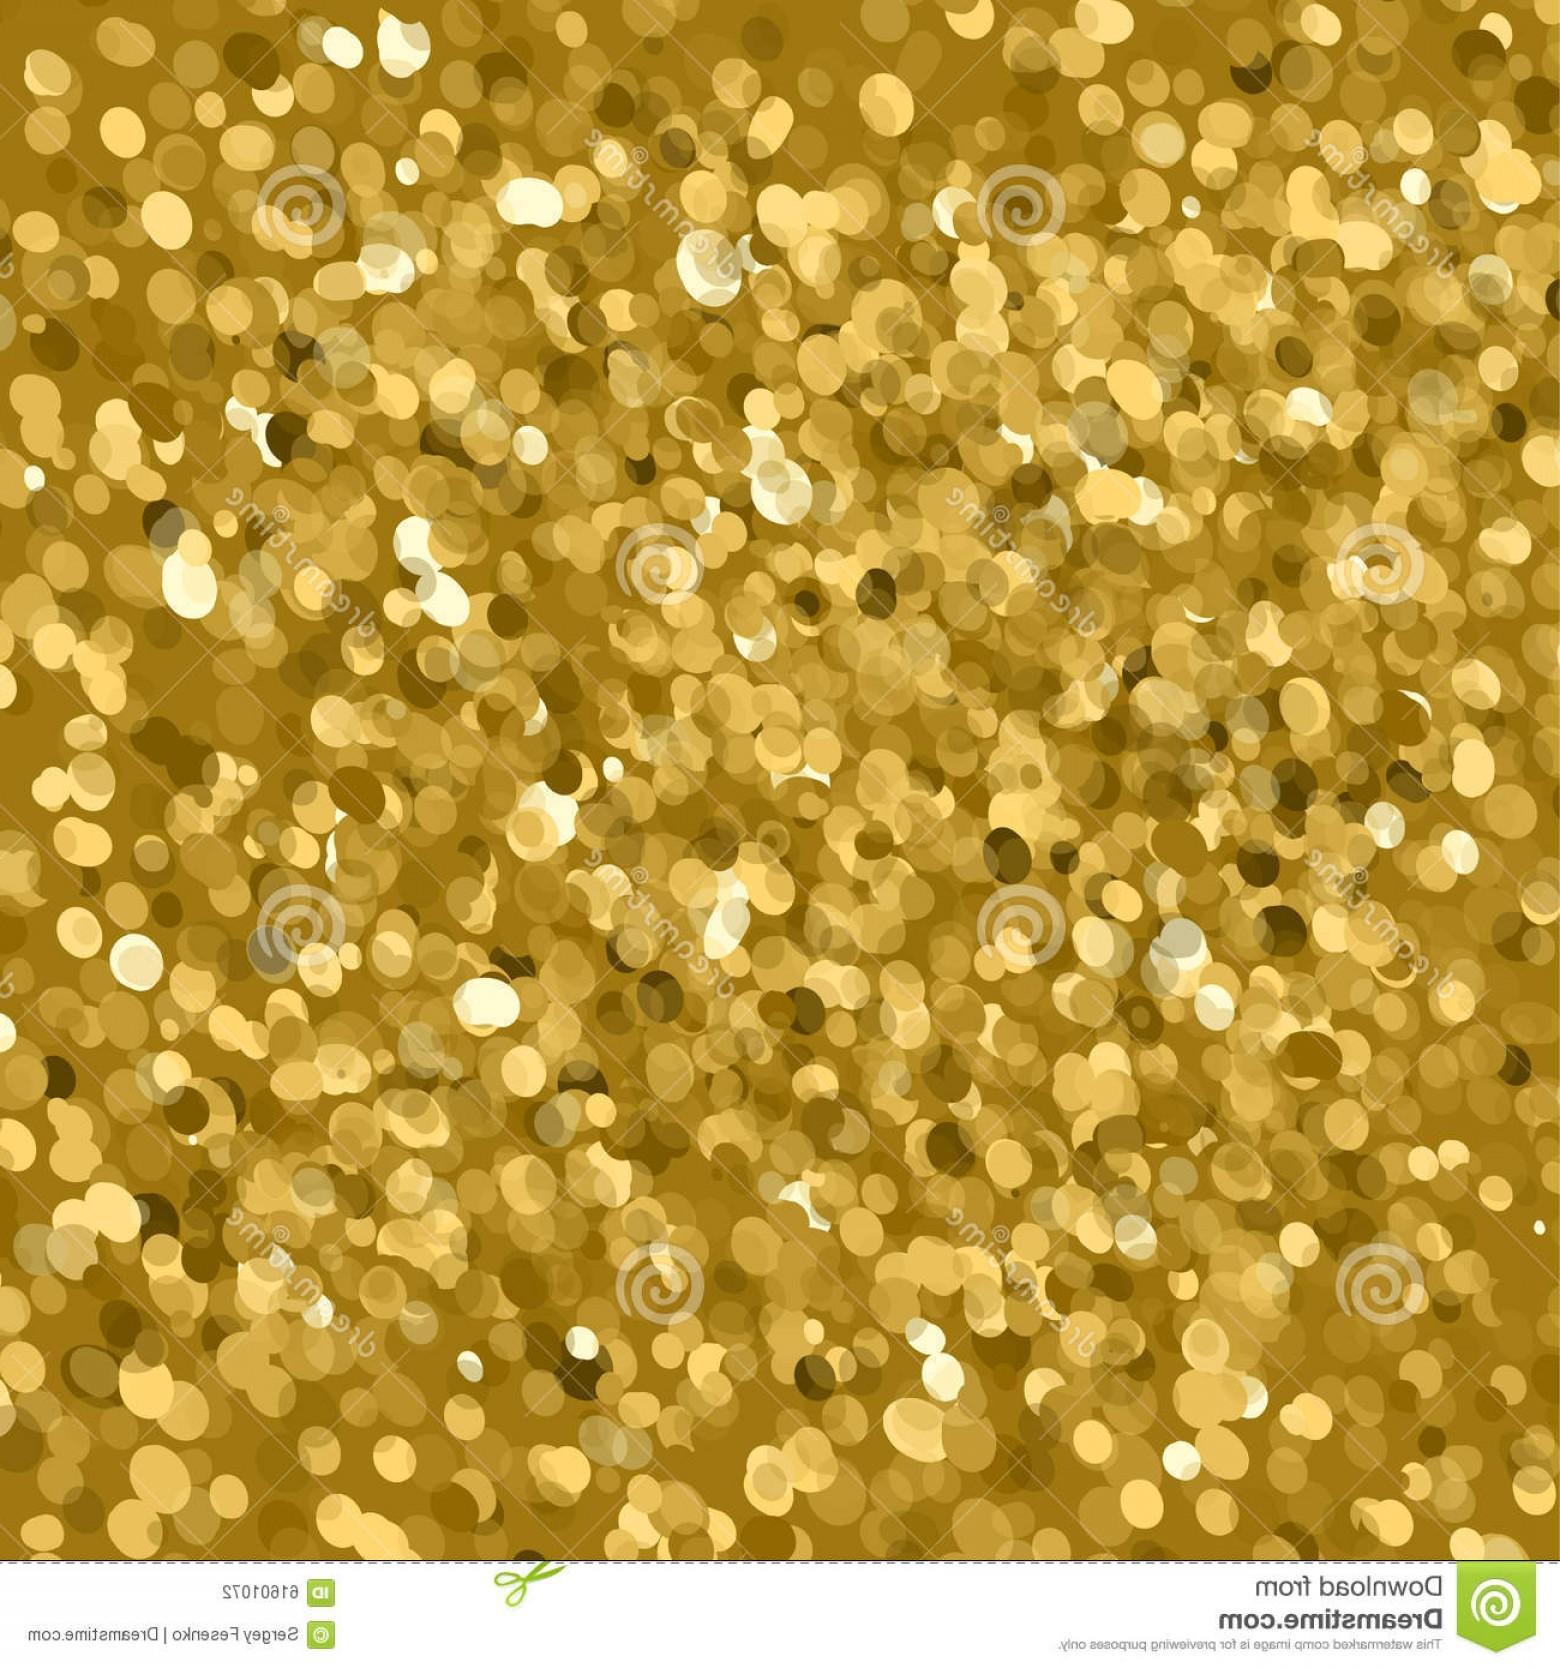 1560x1668 Stock Illustration Gold Glitter Texture Vector Golden Explosion